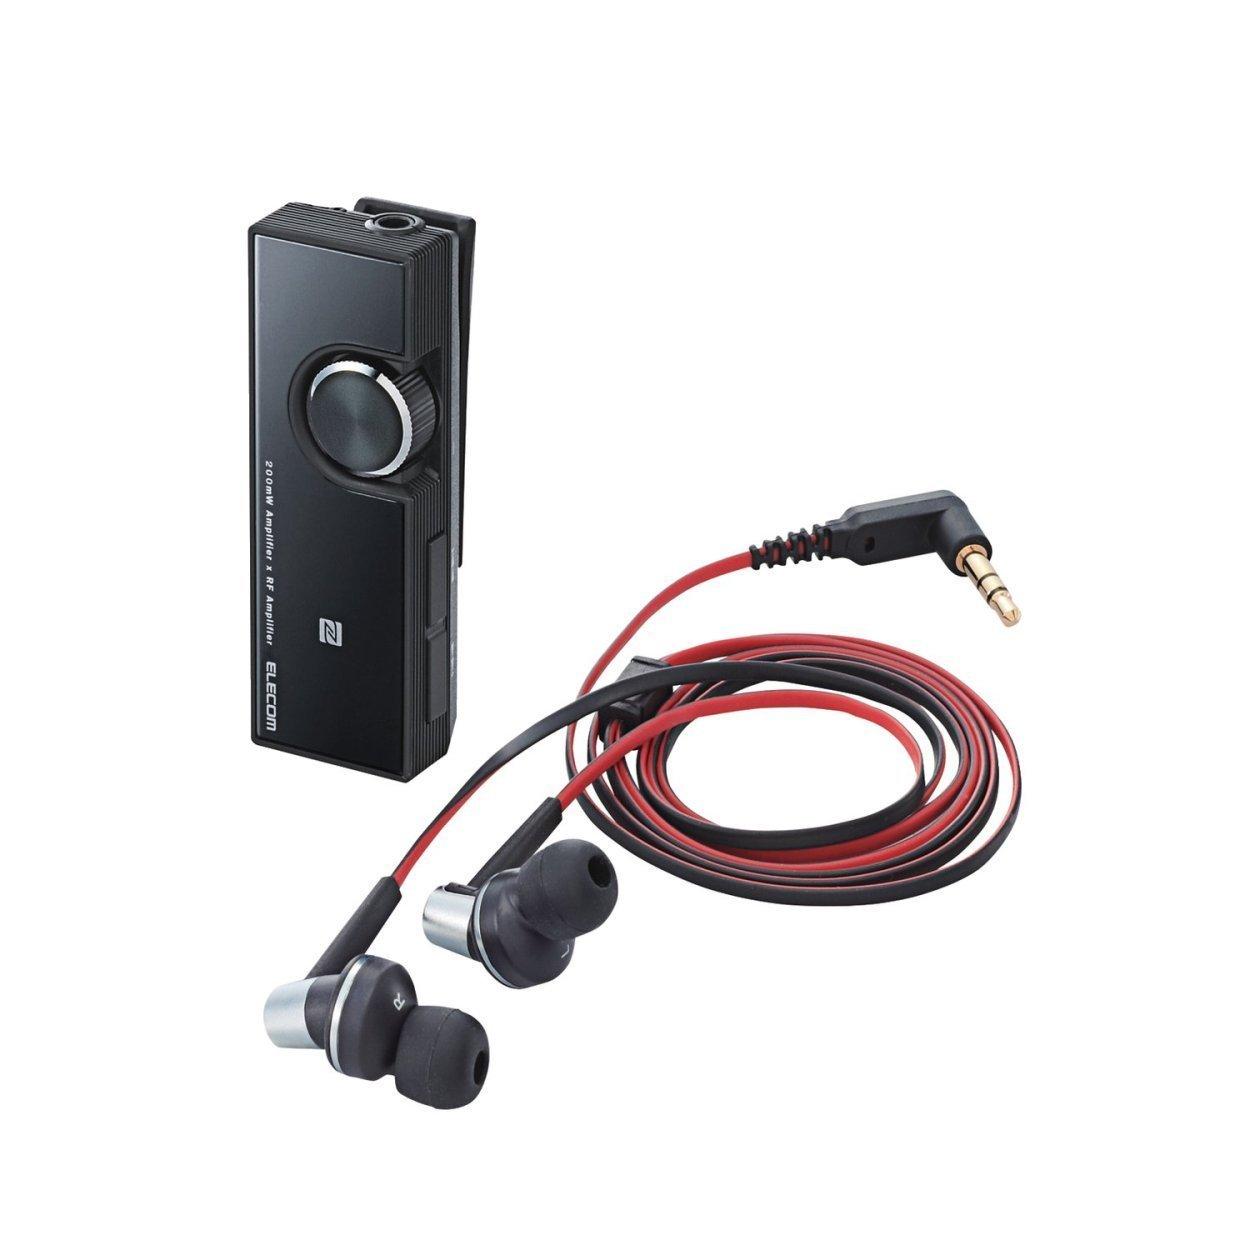 NEW ELECOM �Bluetooth Dual Amplifier class1 headset NFC LBT-PHP500AVBK Japan F/S